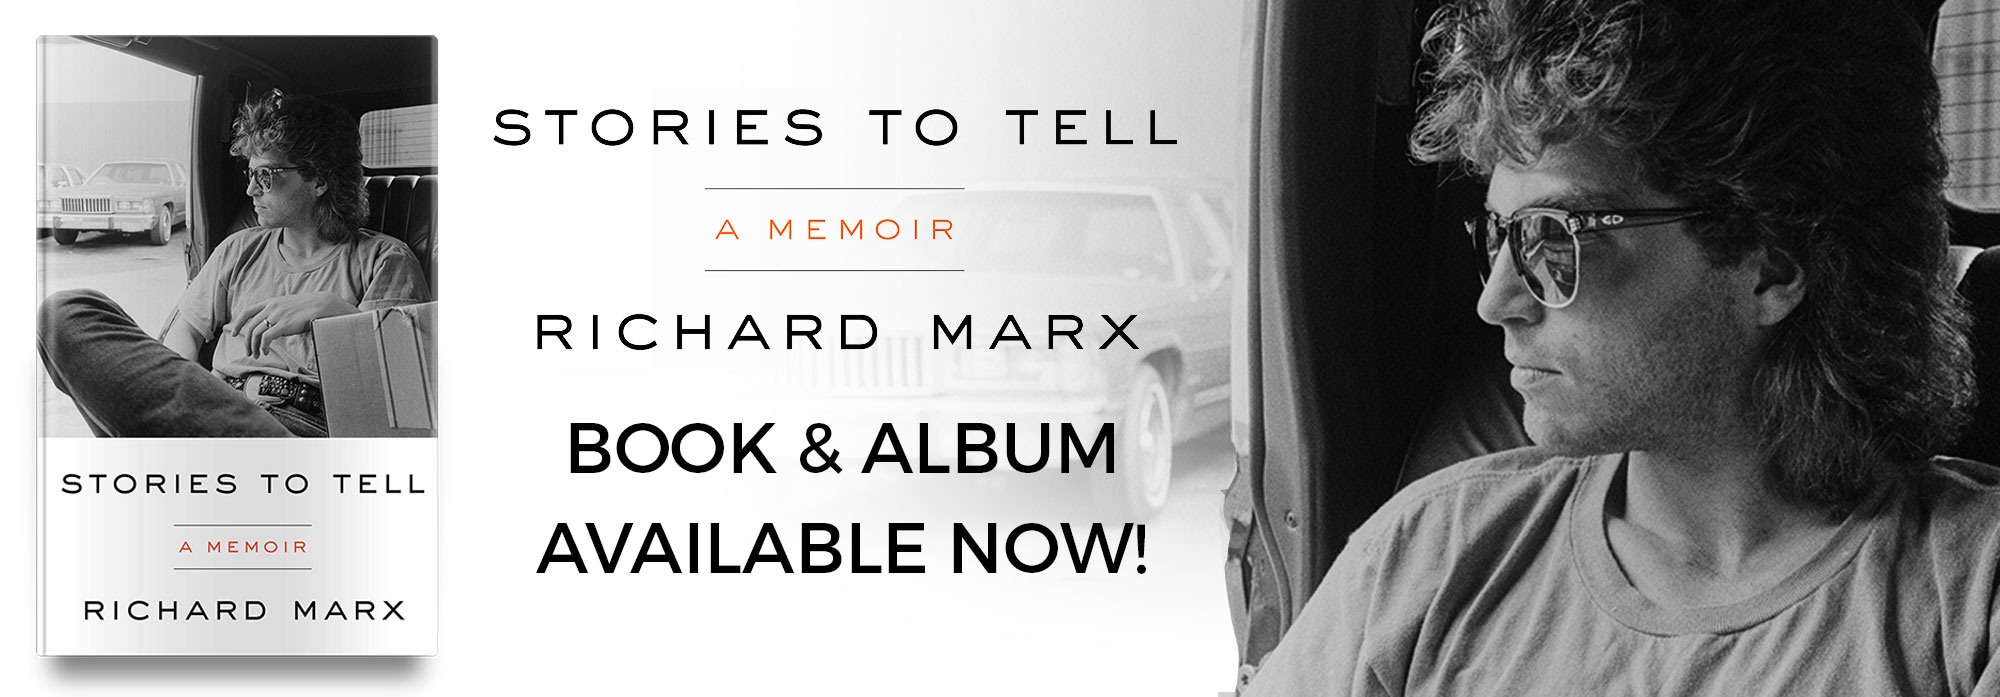 Richard Marx - Memoir (Stories To Tell)